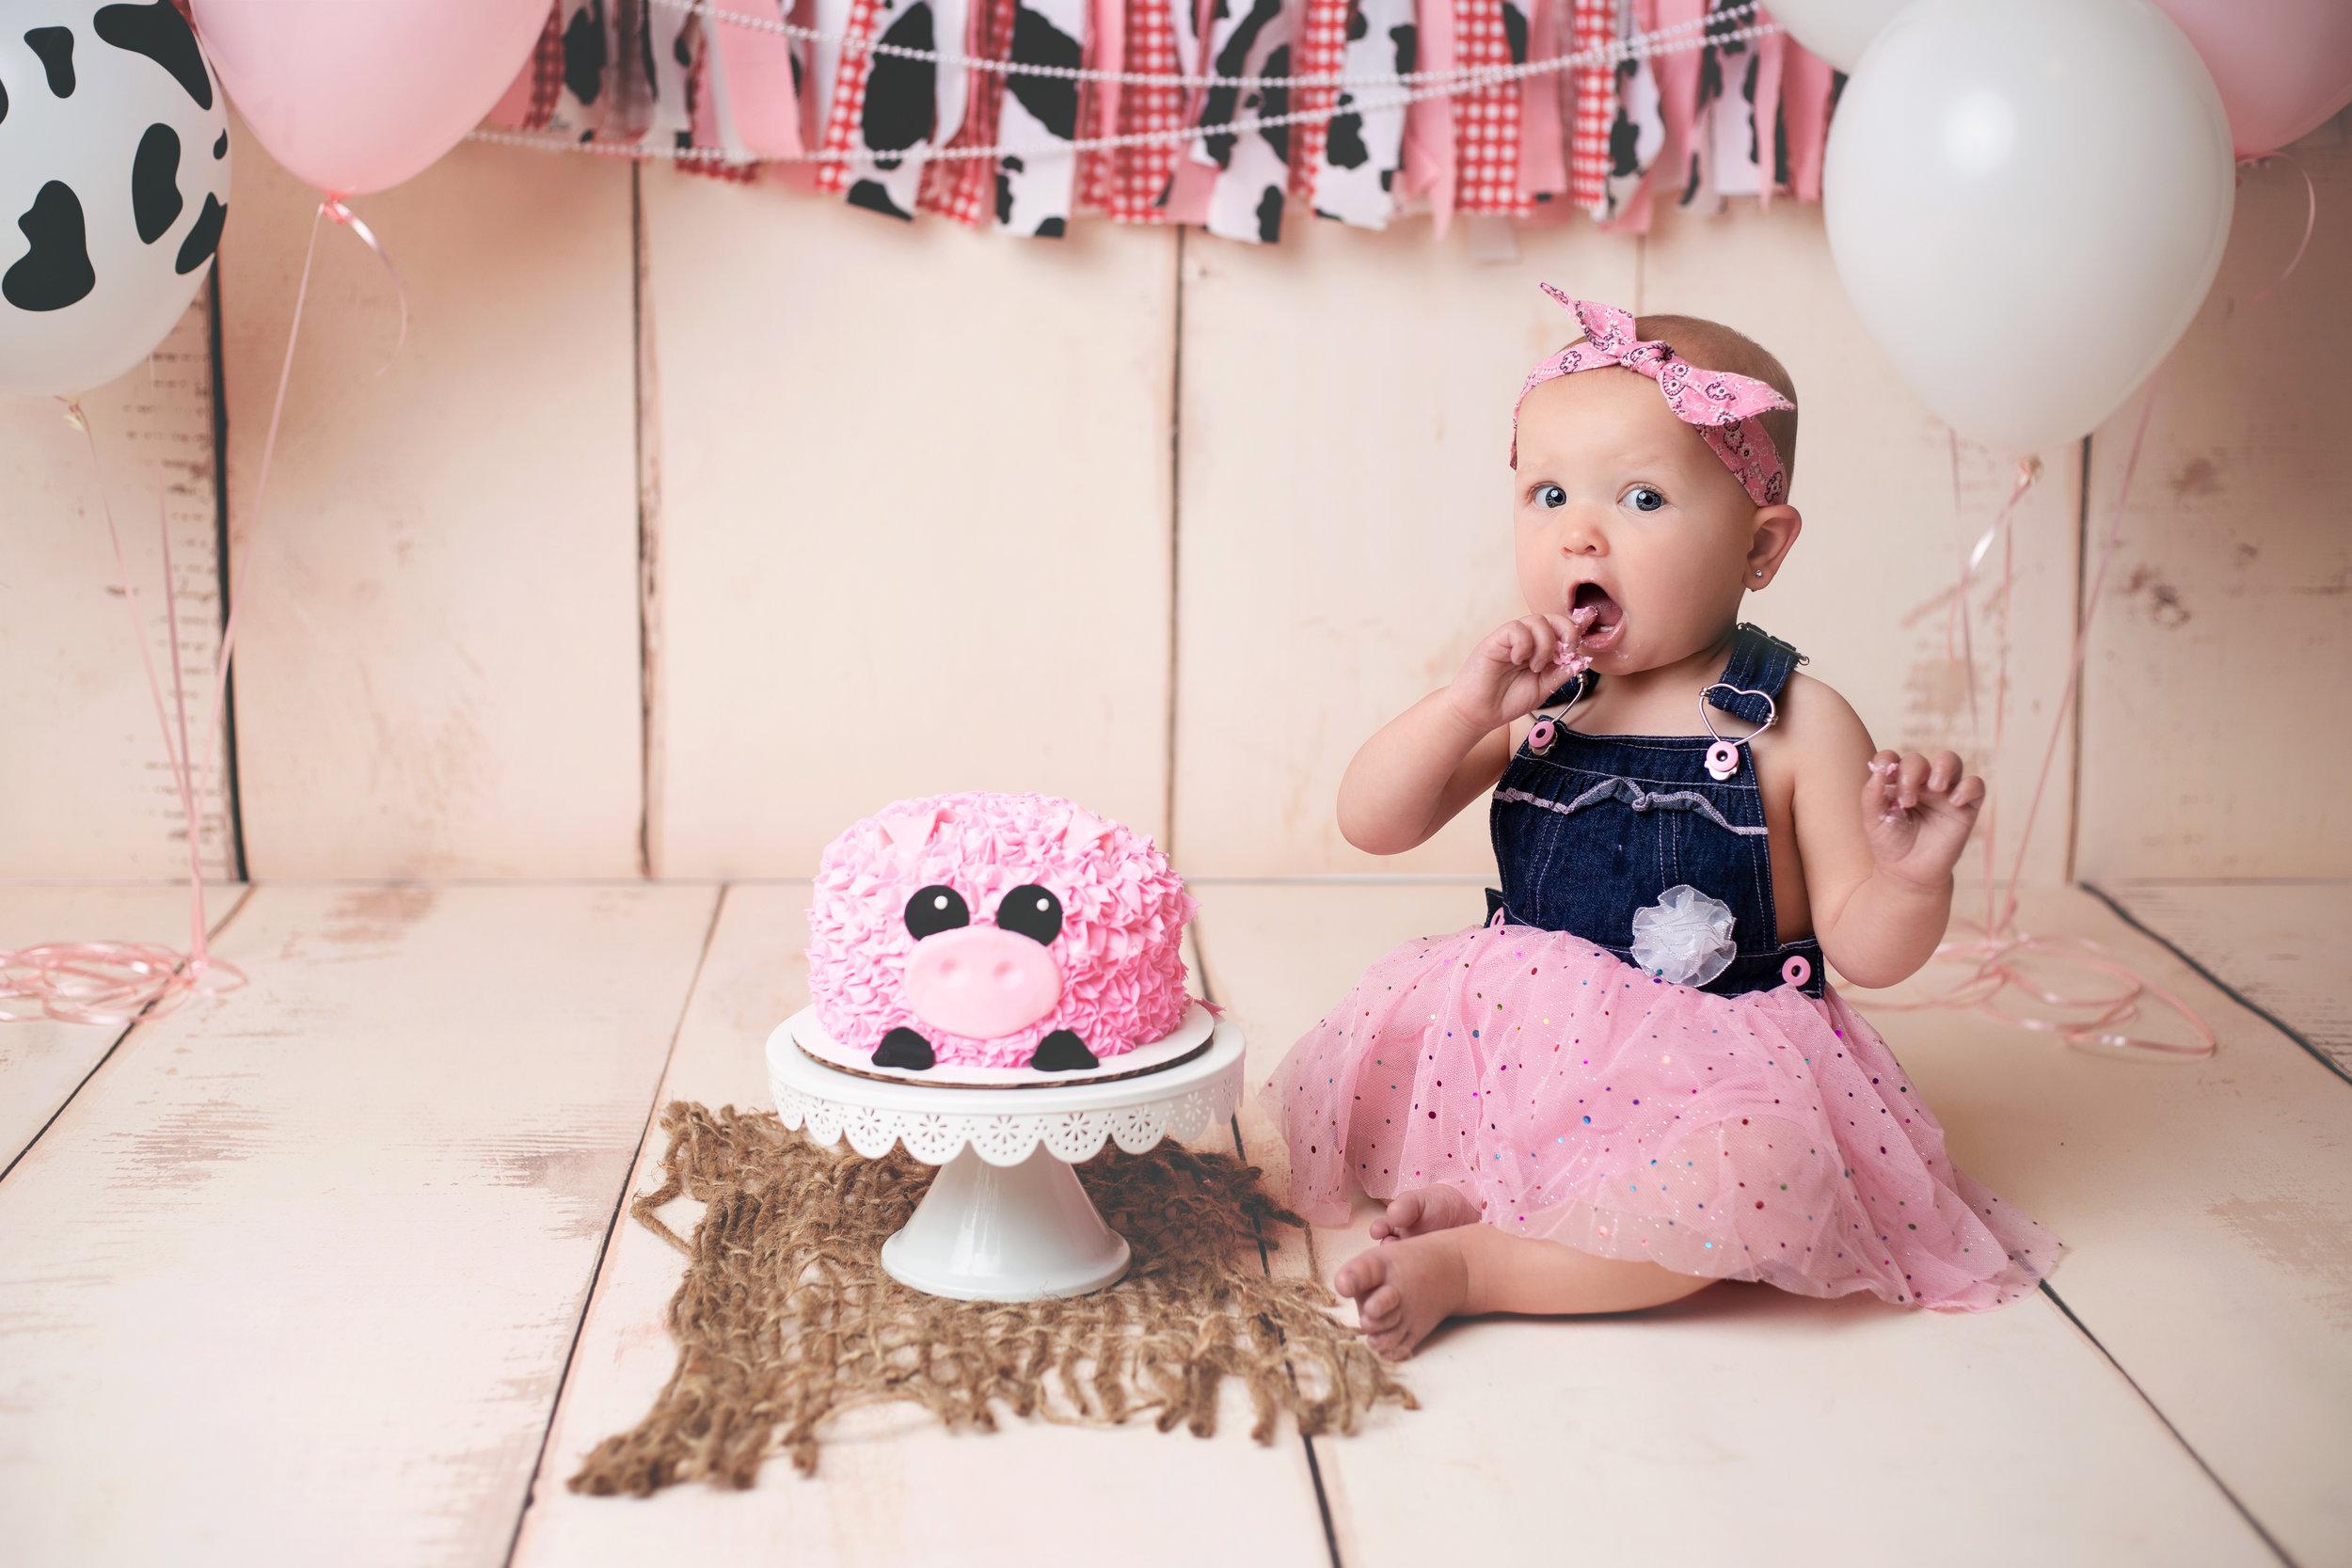 anchorage-cake-smash-photographer-1.jpg